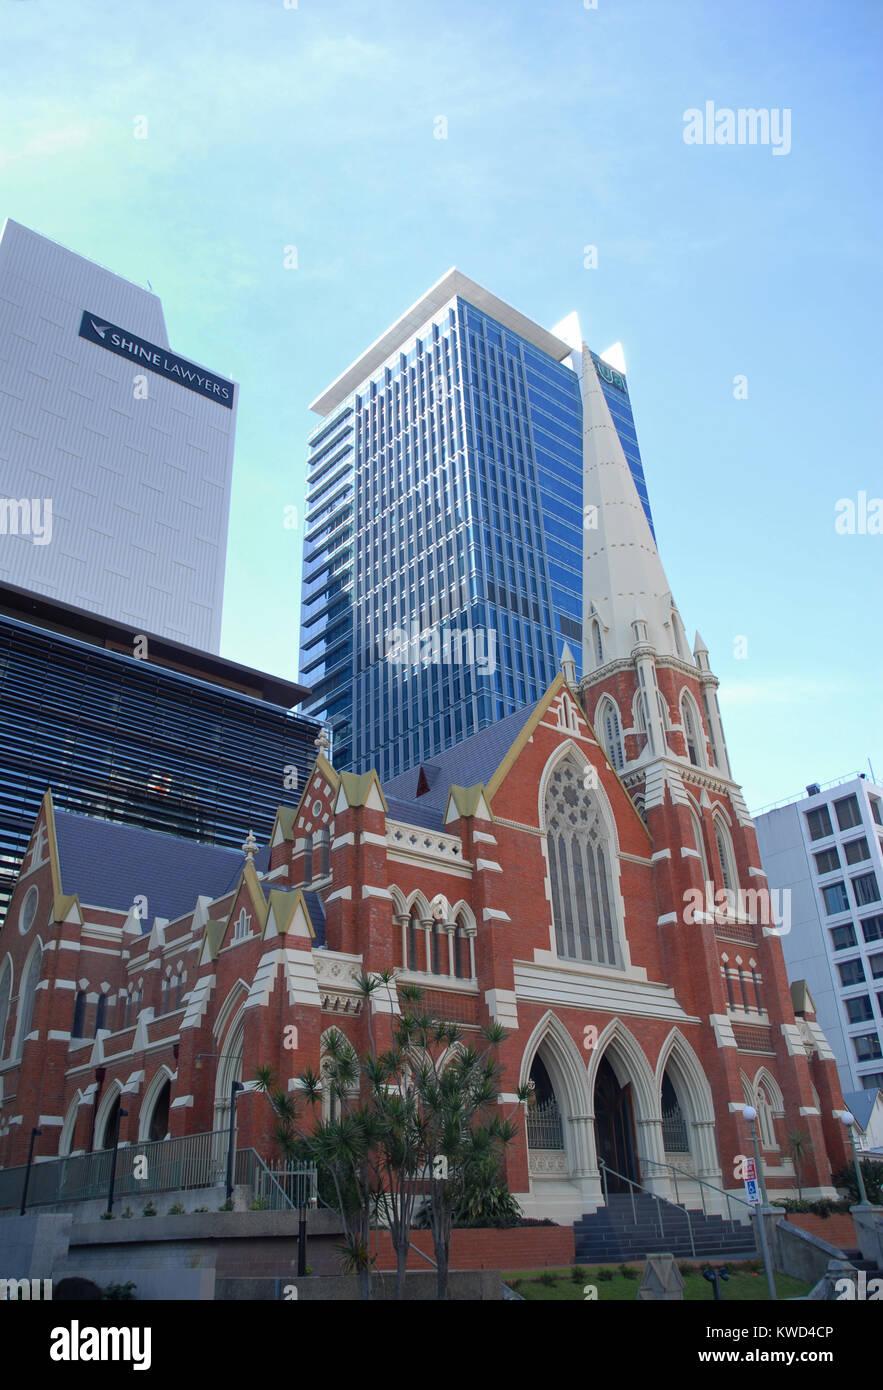 Brisbane, Australia - July 28, 2017: Albert Street Uniting Church and King George Central - Stock Image